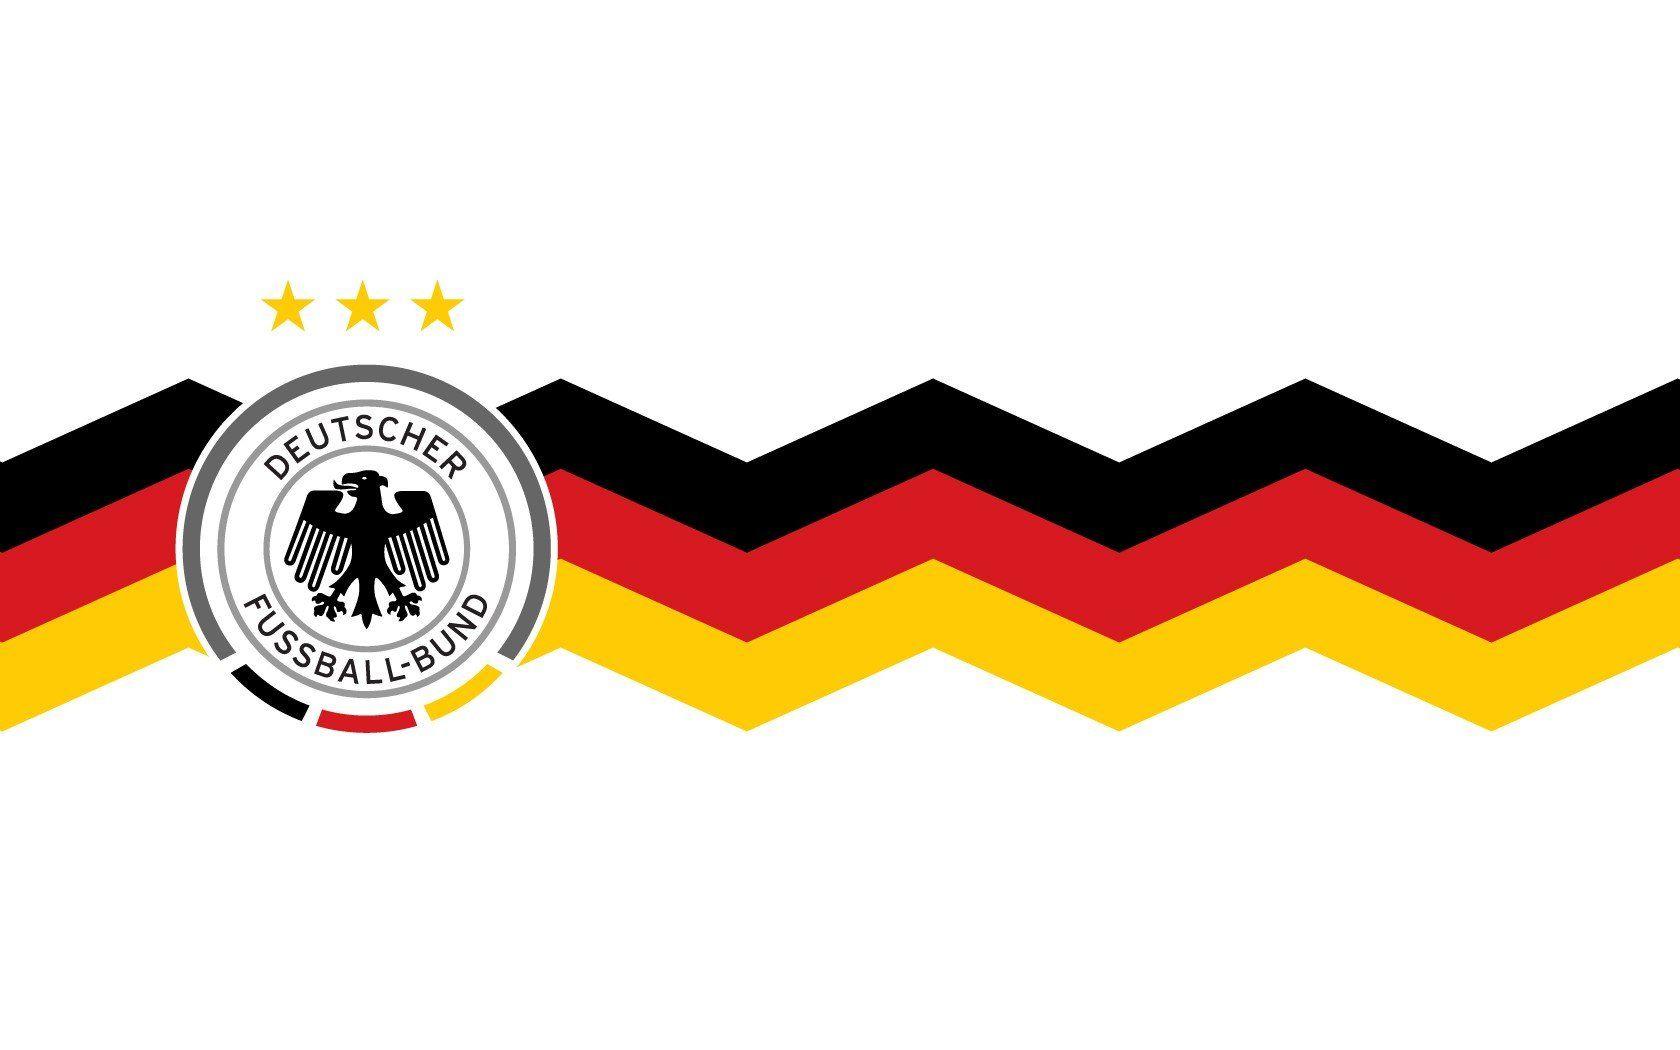 Germany Football World Cup Wallpaper Hd Facebook Covergermany Football World Cup Desain Logo Desain